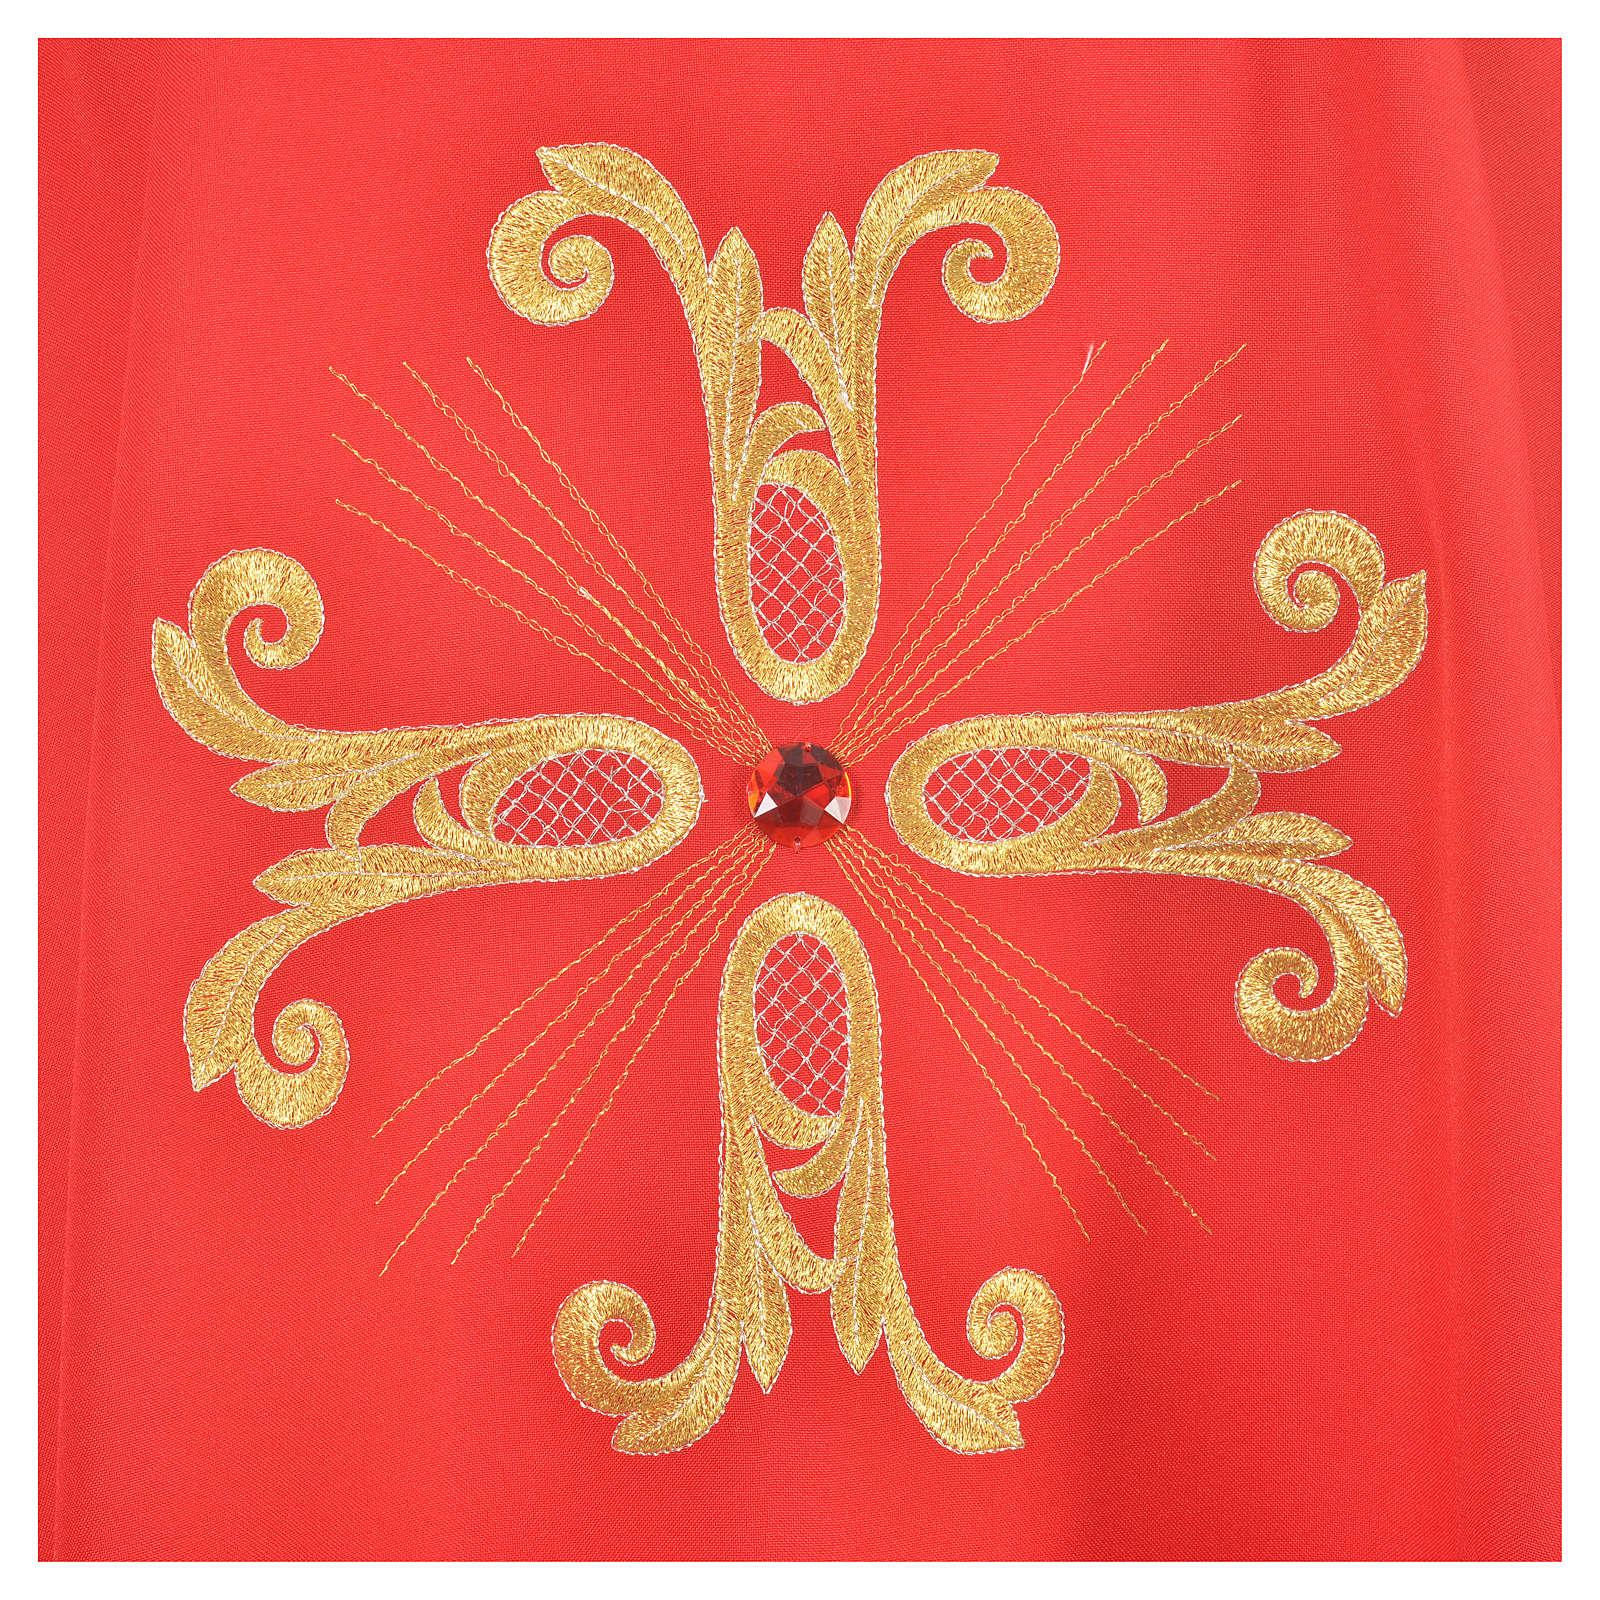 Ornat krzyż złocony perełka szklana 4